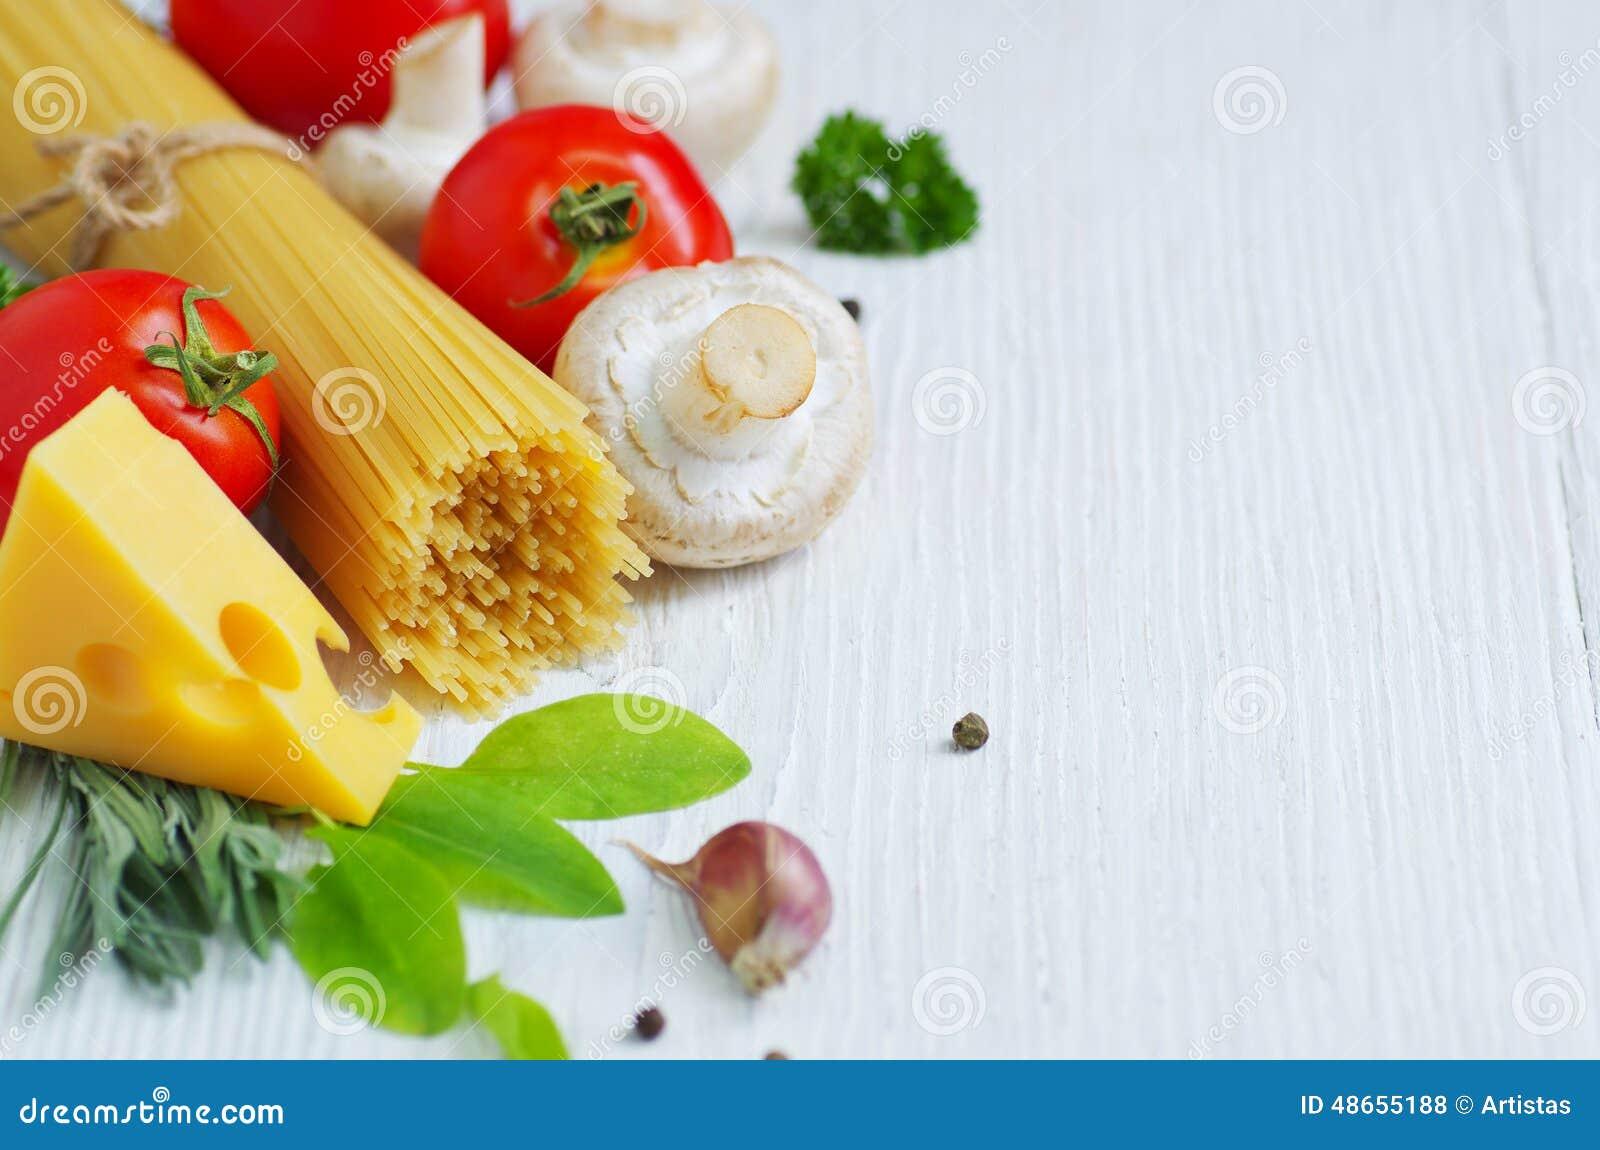 Ingr dients de cuisine italienne traditionnelle photo for Cuisine blanche traditionnelle